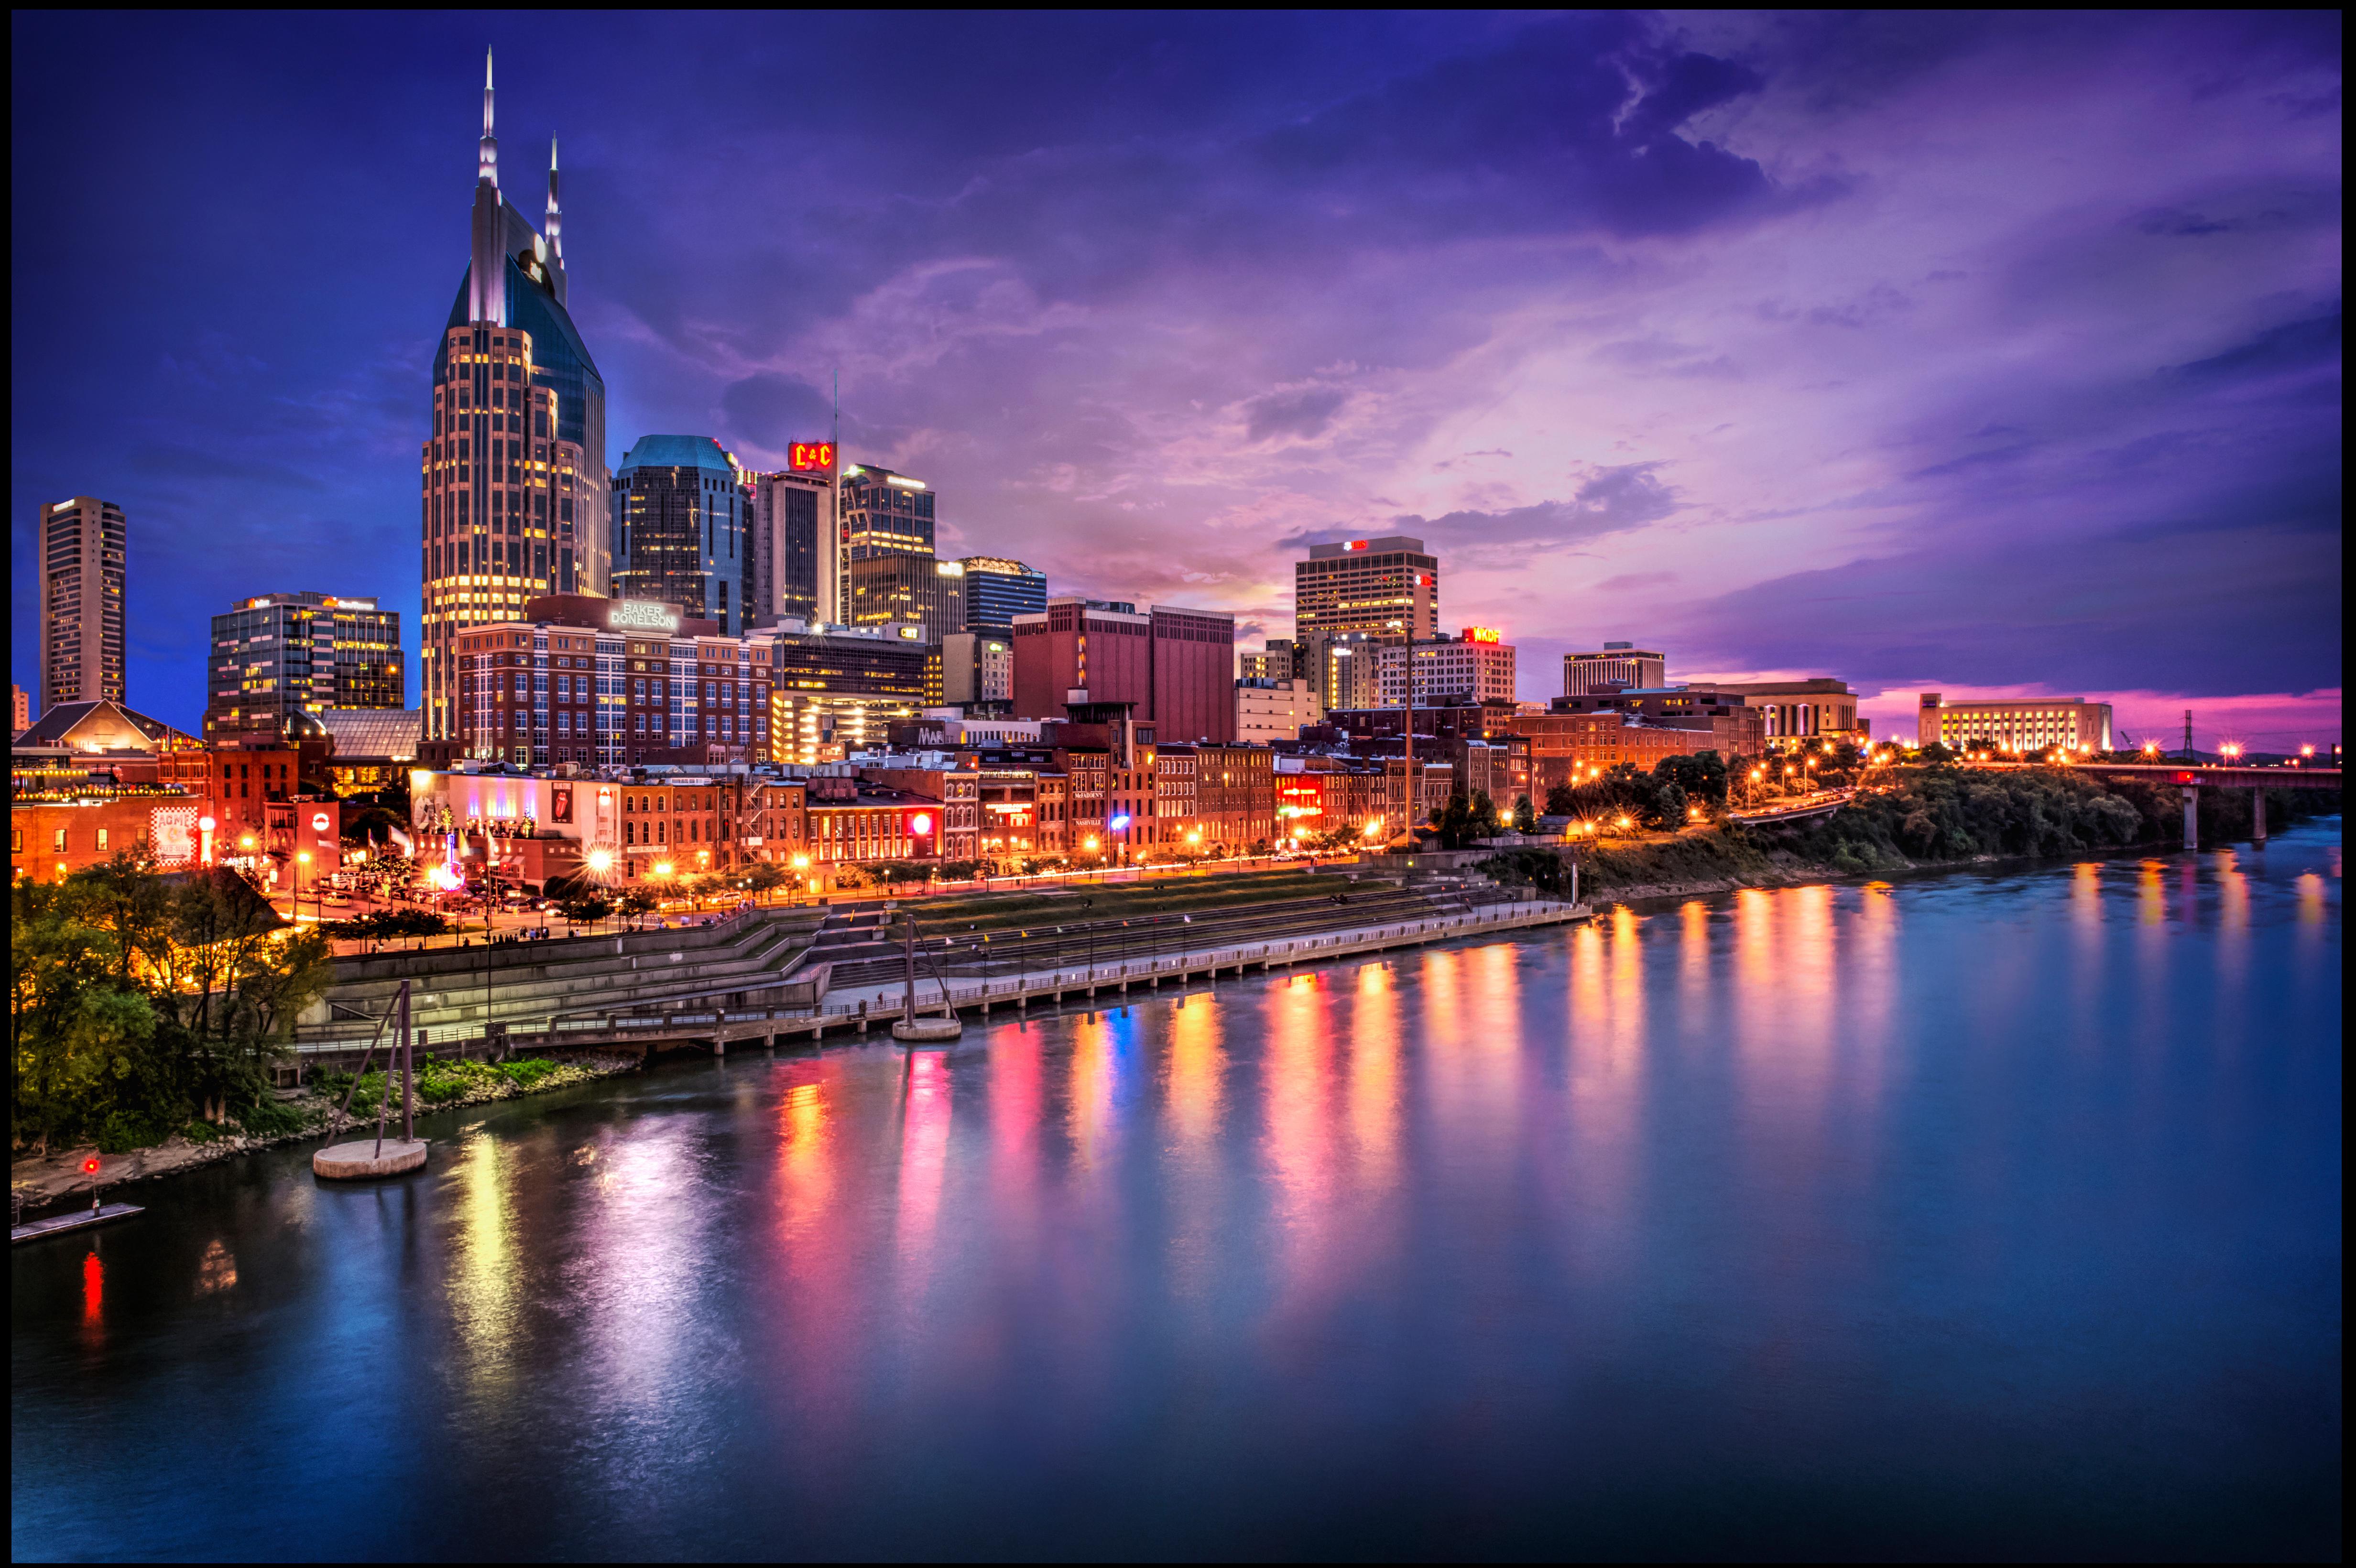 Skyline notturno-Nashville-Tennessee.USA-Foto di Ann Richardson